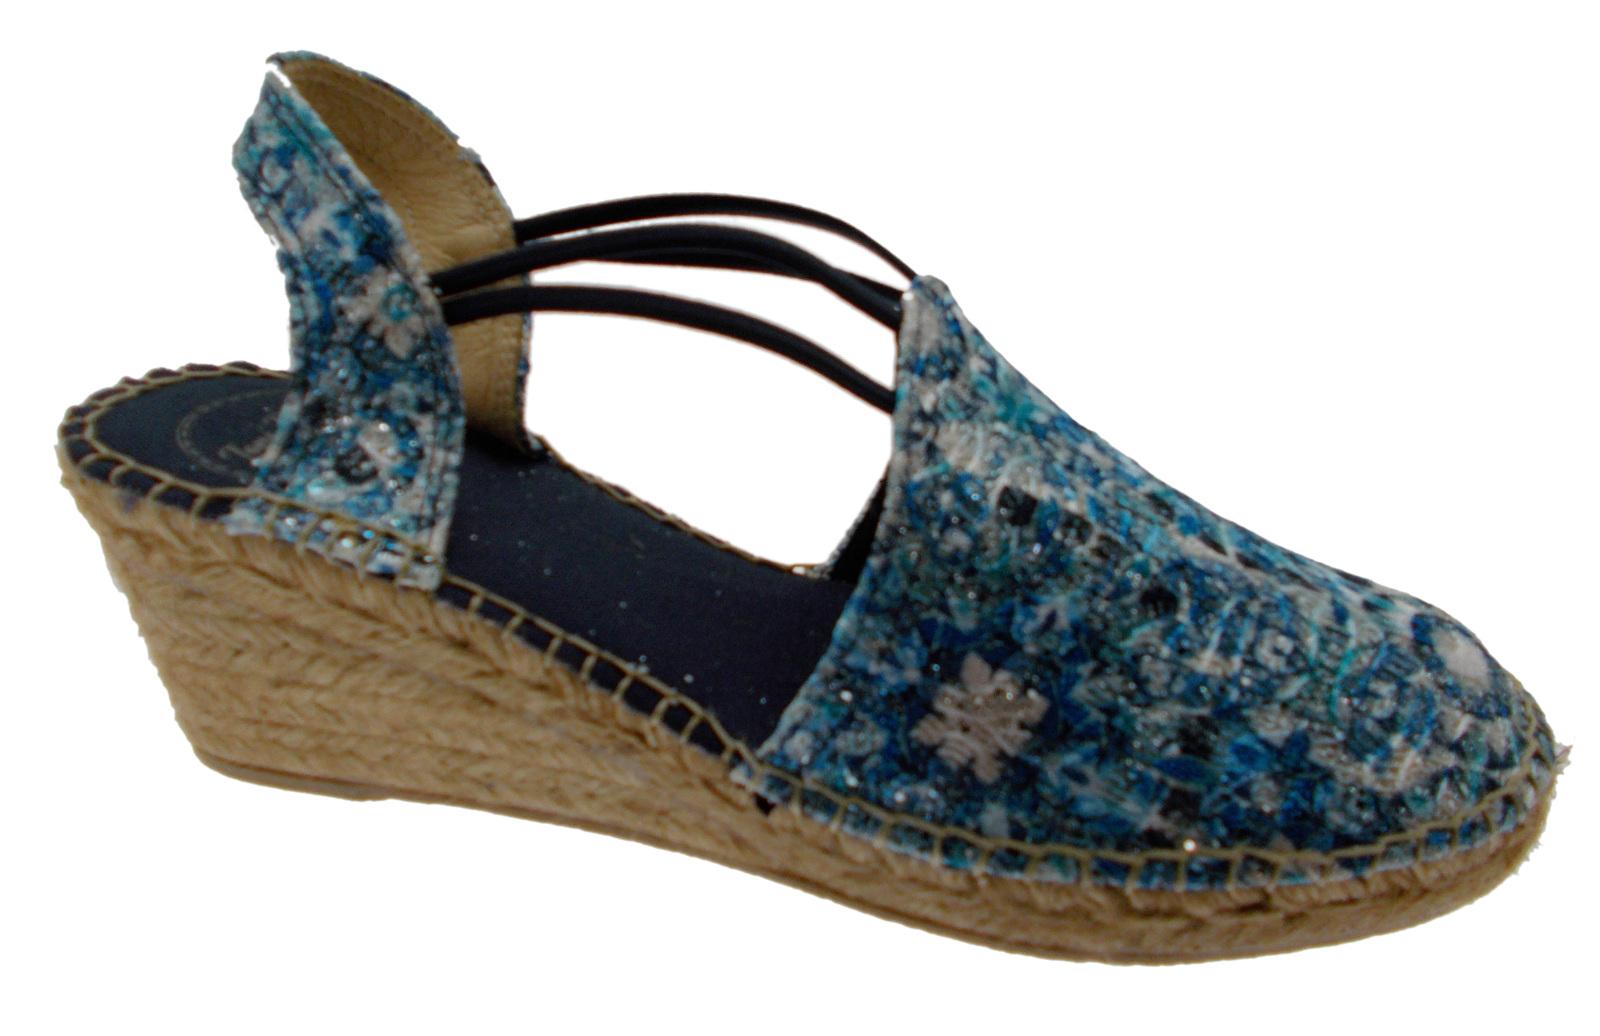 Descuento por tiempo limitado sandalo donna corda blu bianco zeppa art TORELLO fantasia espadrillas Toni Pons